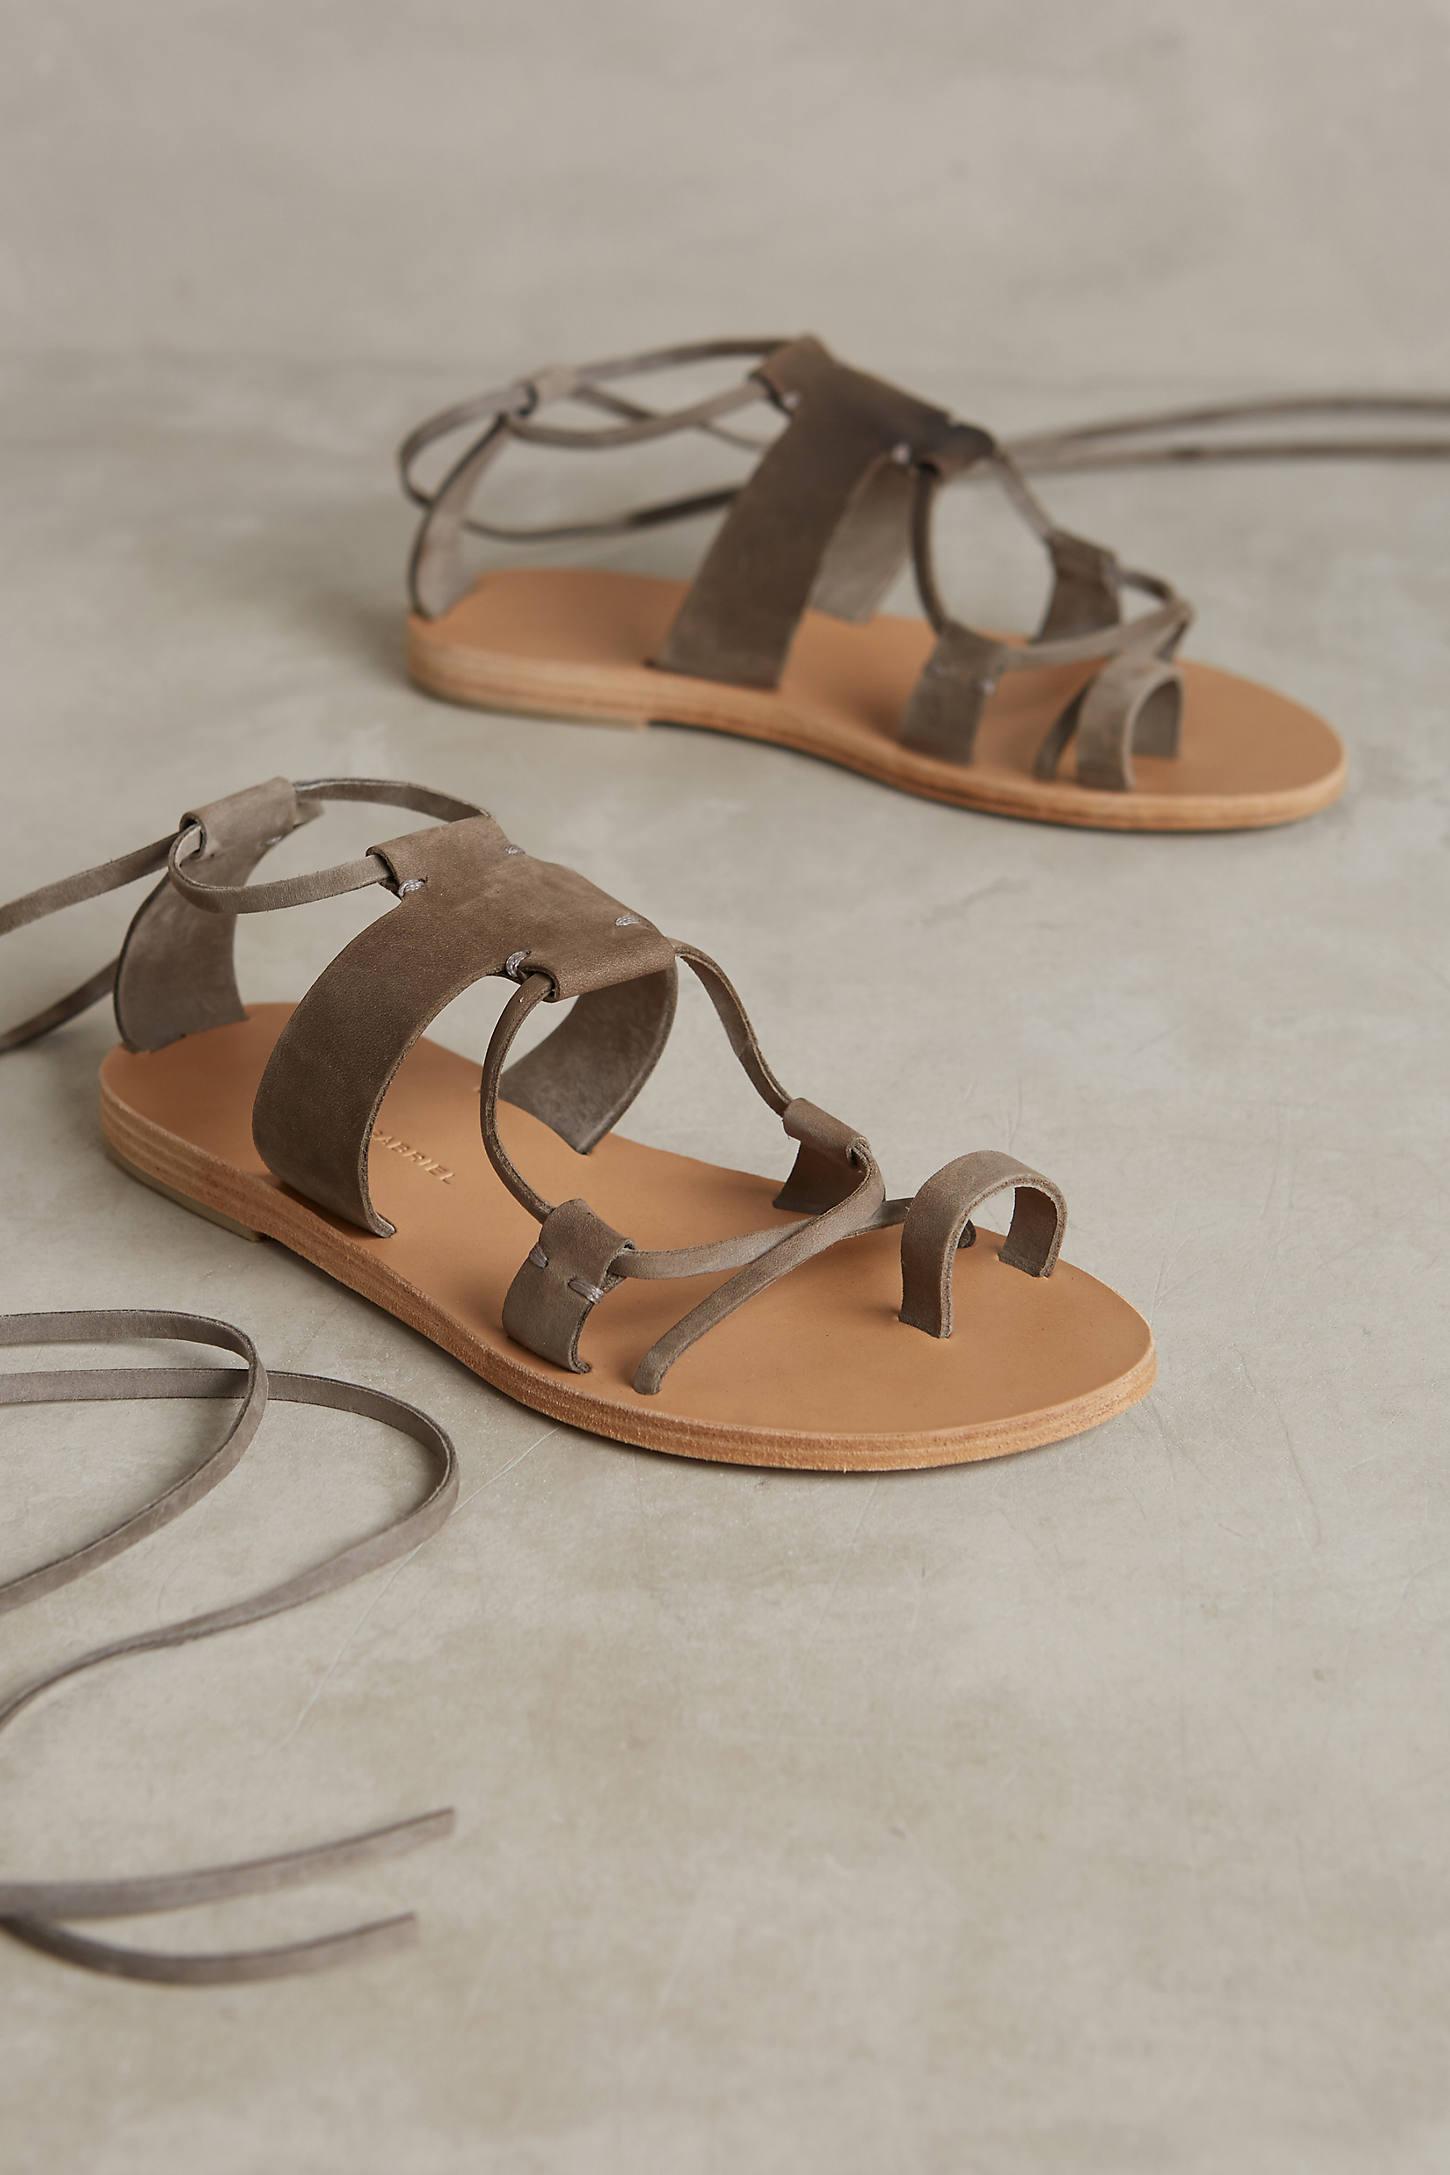 Valia Gabriel Goa Gladiator Sandals